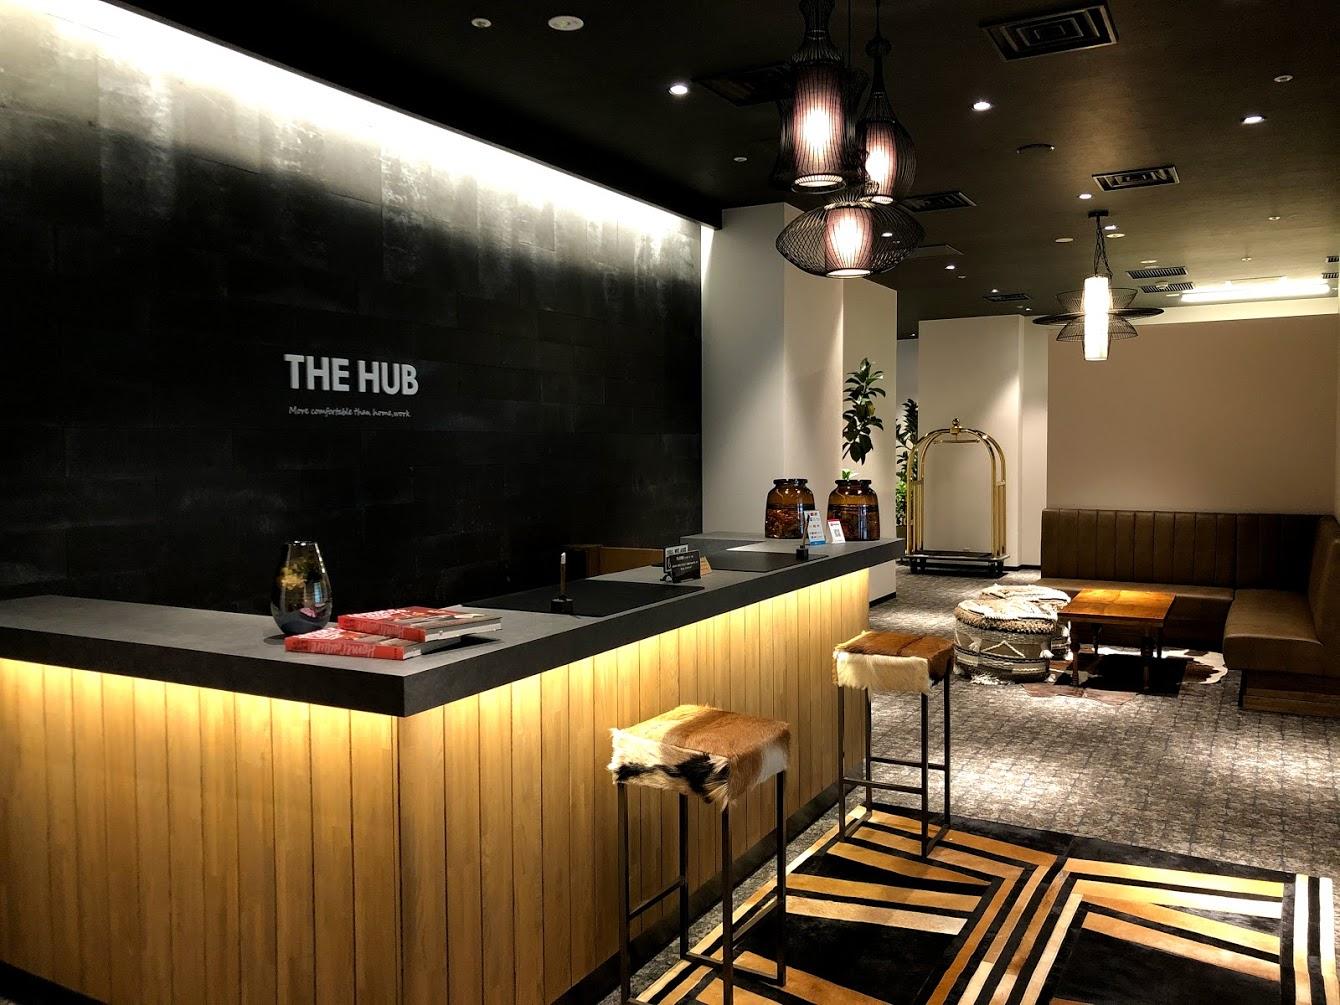 the hub新宿ワシントンの受付_外観写真_photo